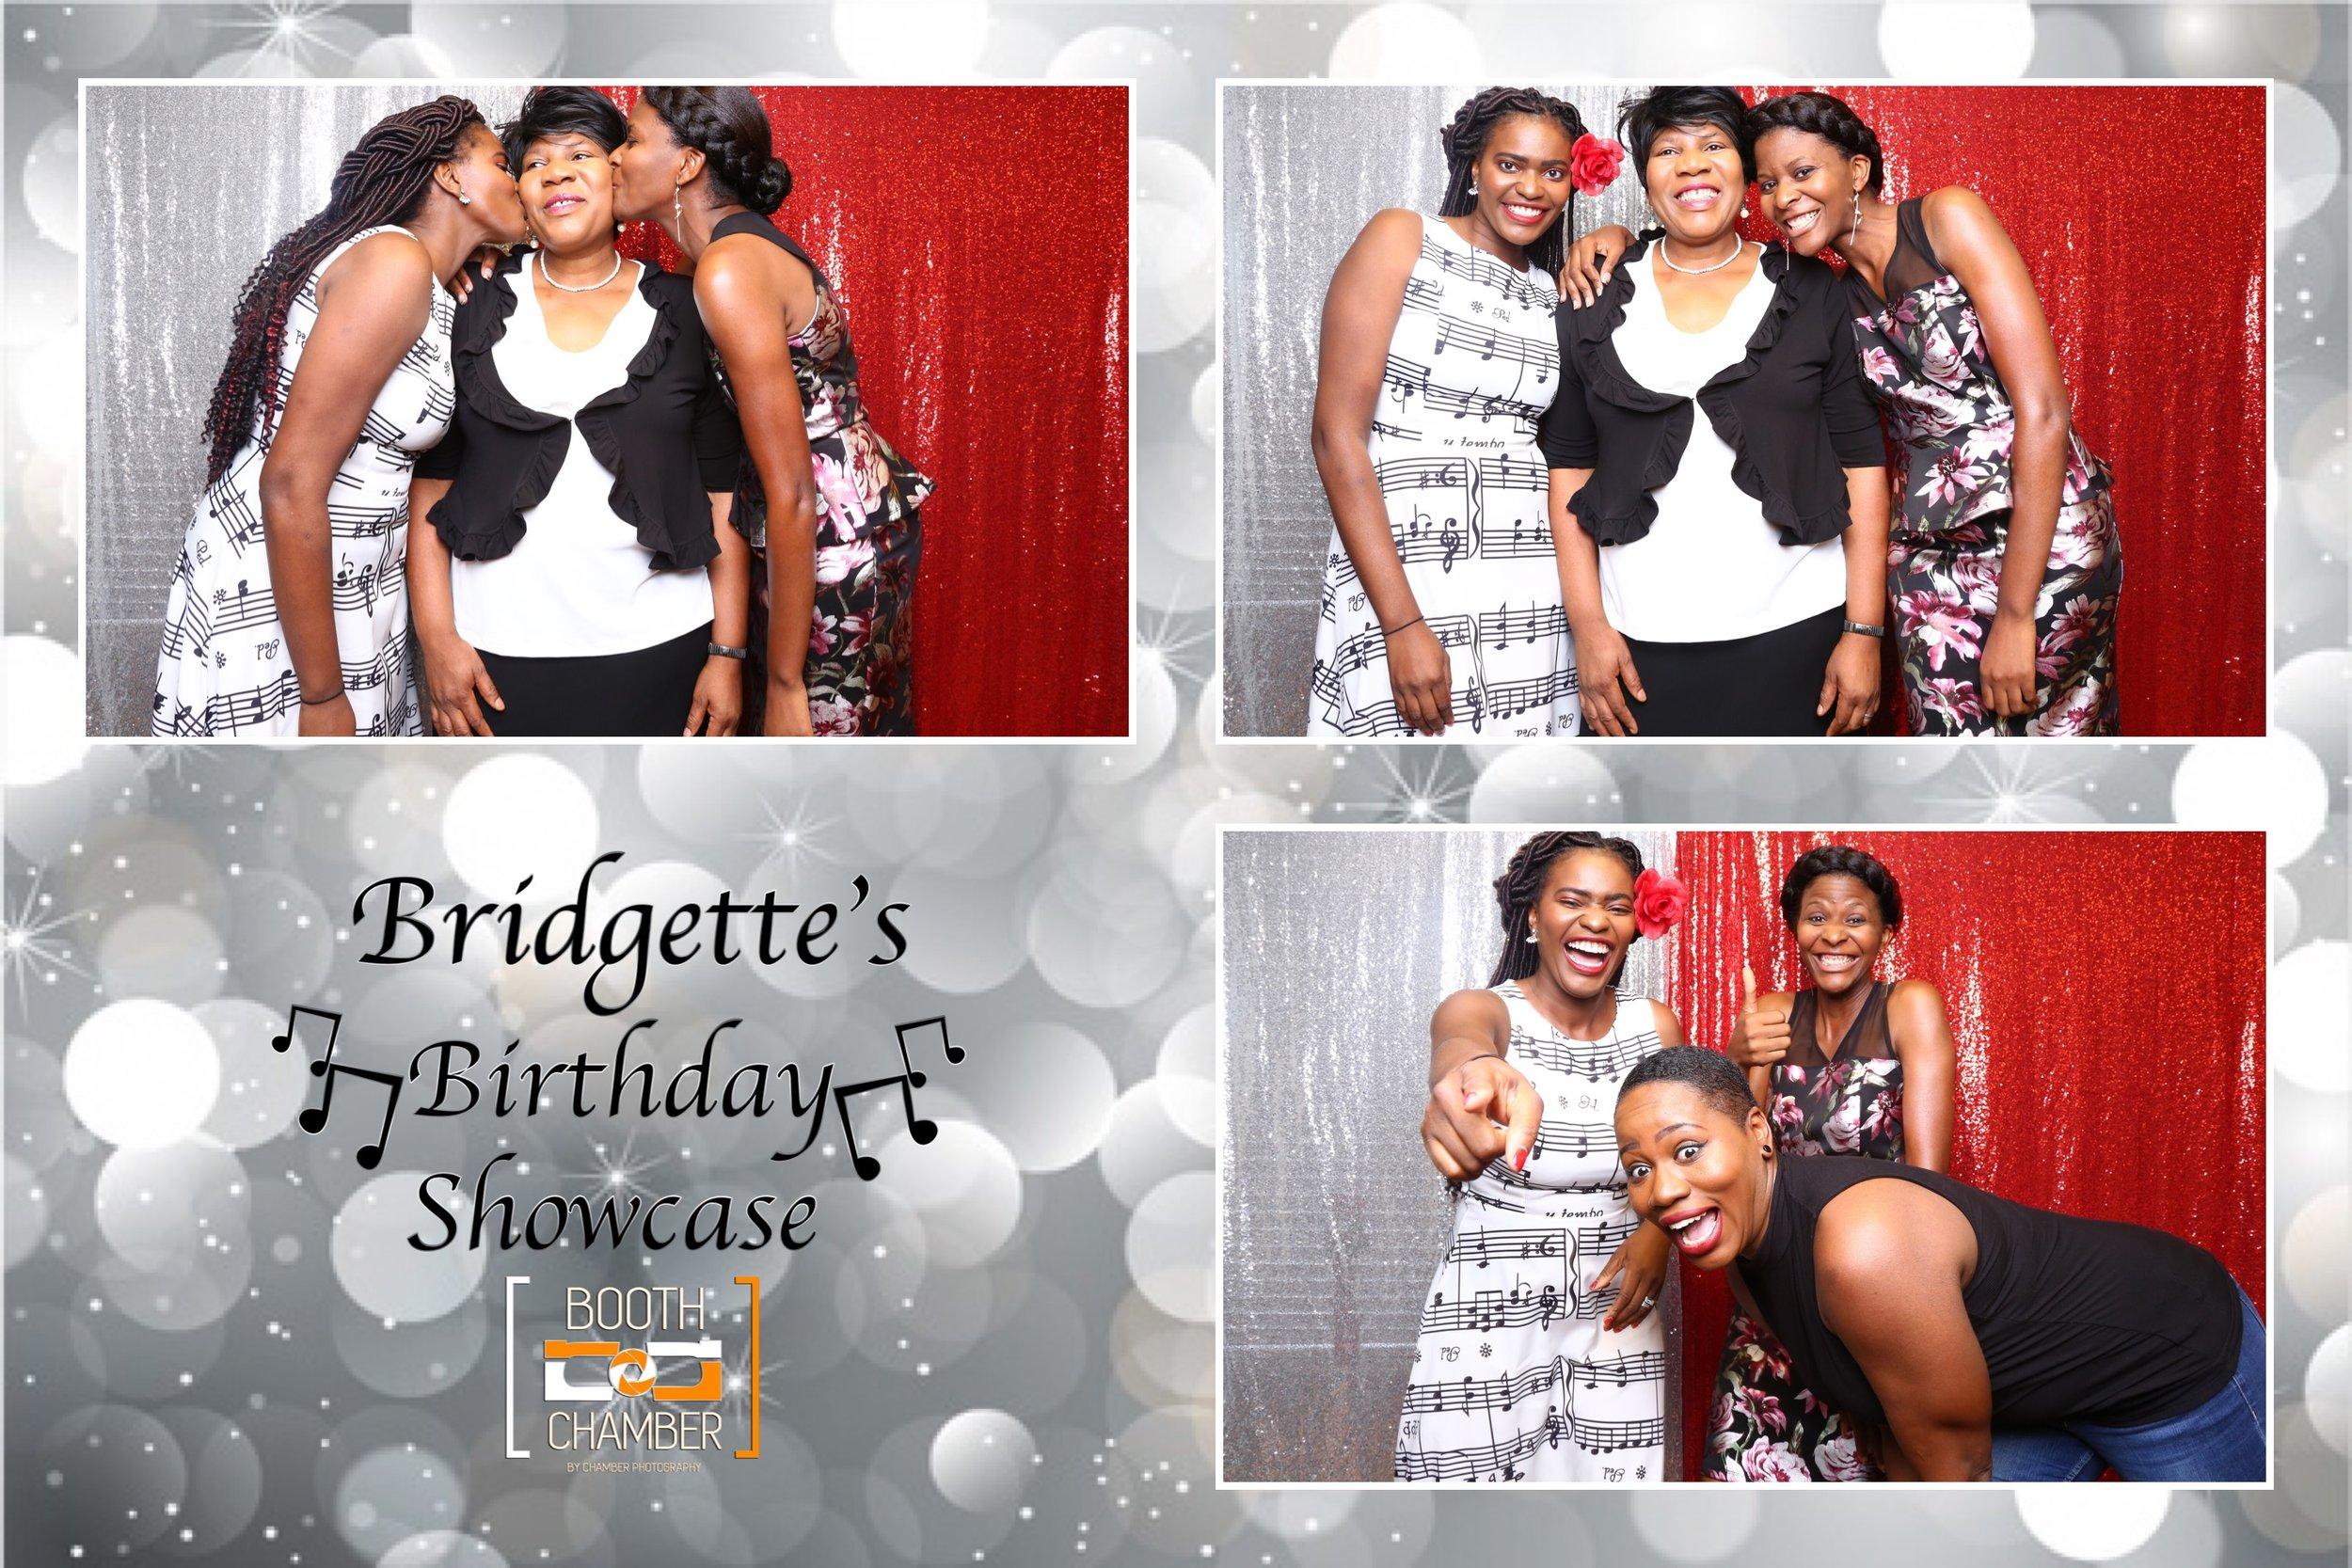 Bridgette's Birthday Showcase-59-04-30-2018.jpg